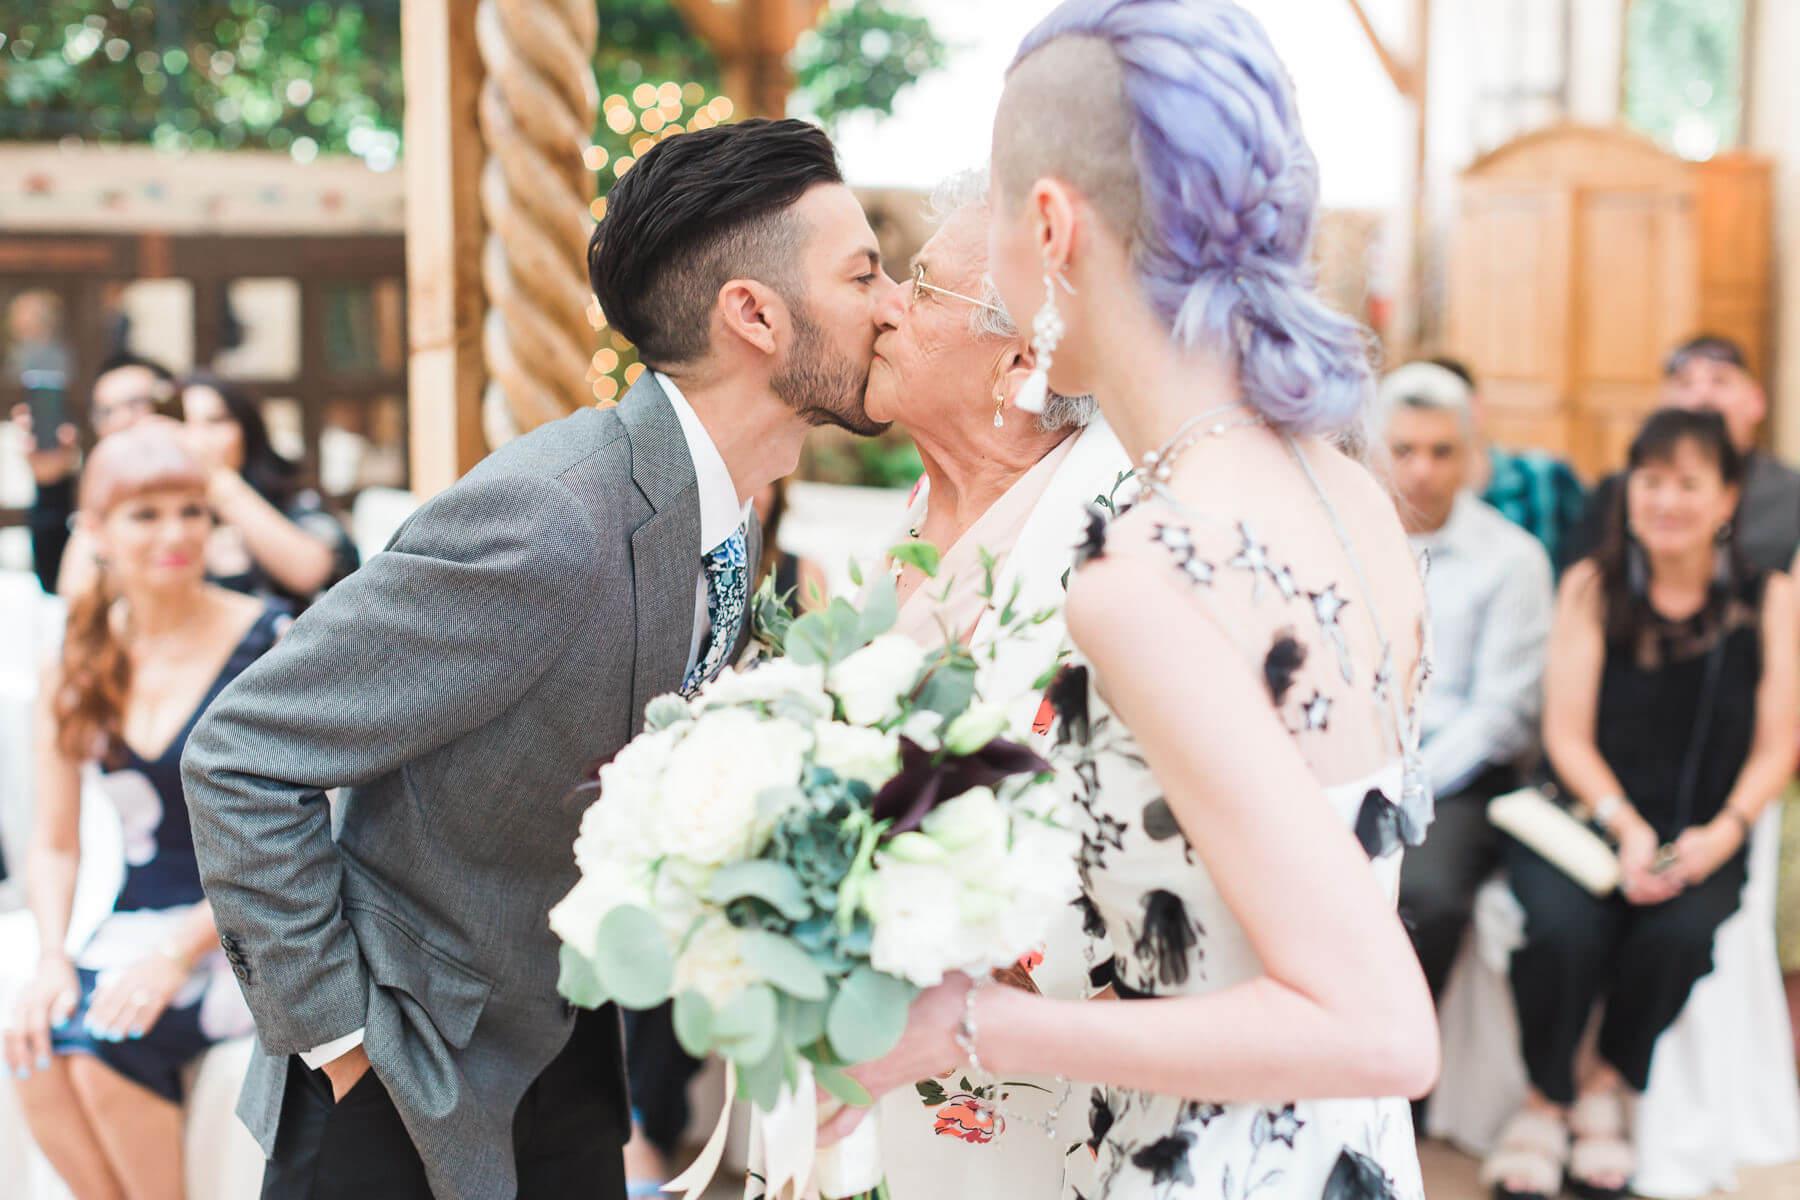 the_light_and_glass-wedding-photography-kim-jon-031.jpg